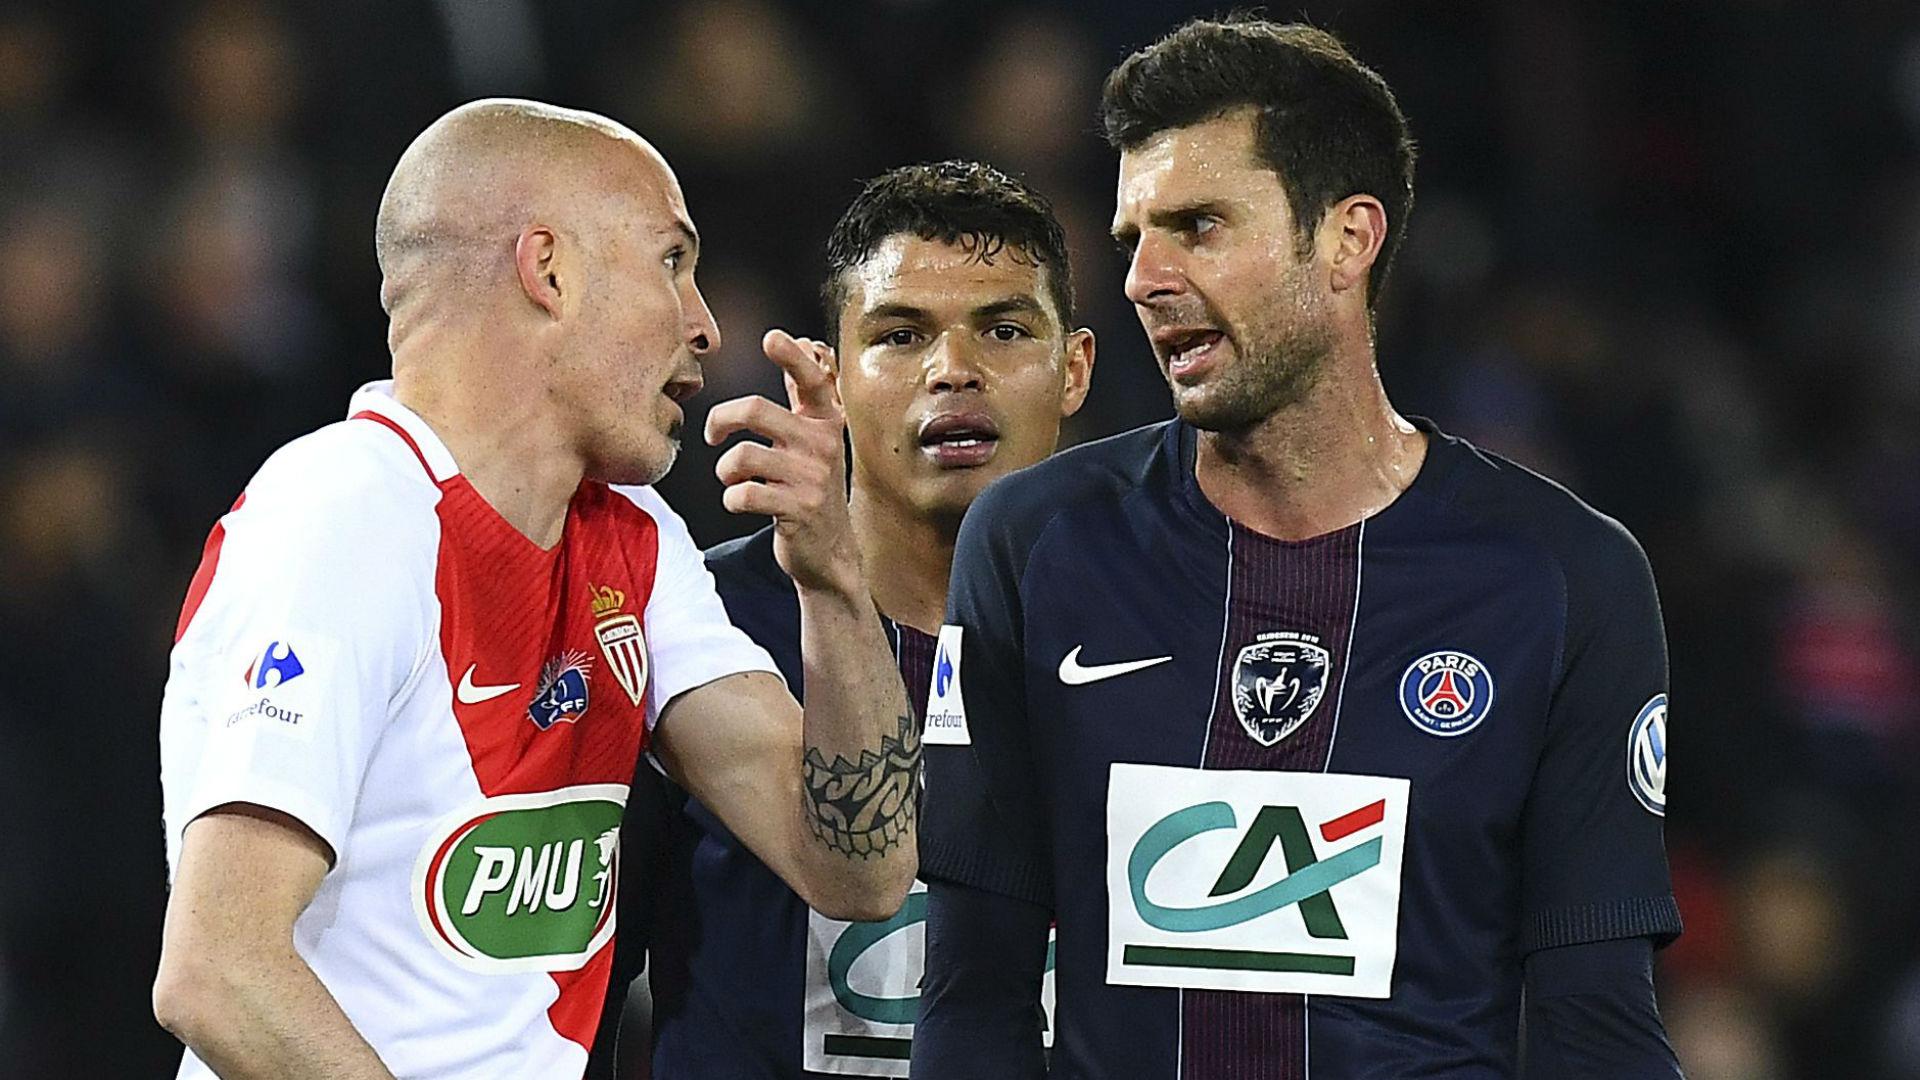 Champions League. Juve, Real Madrid, Atletico, Monaco